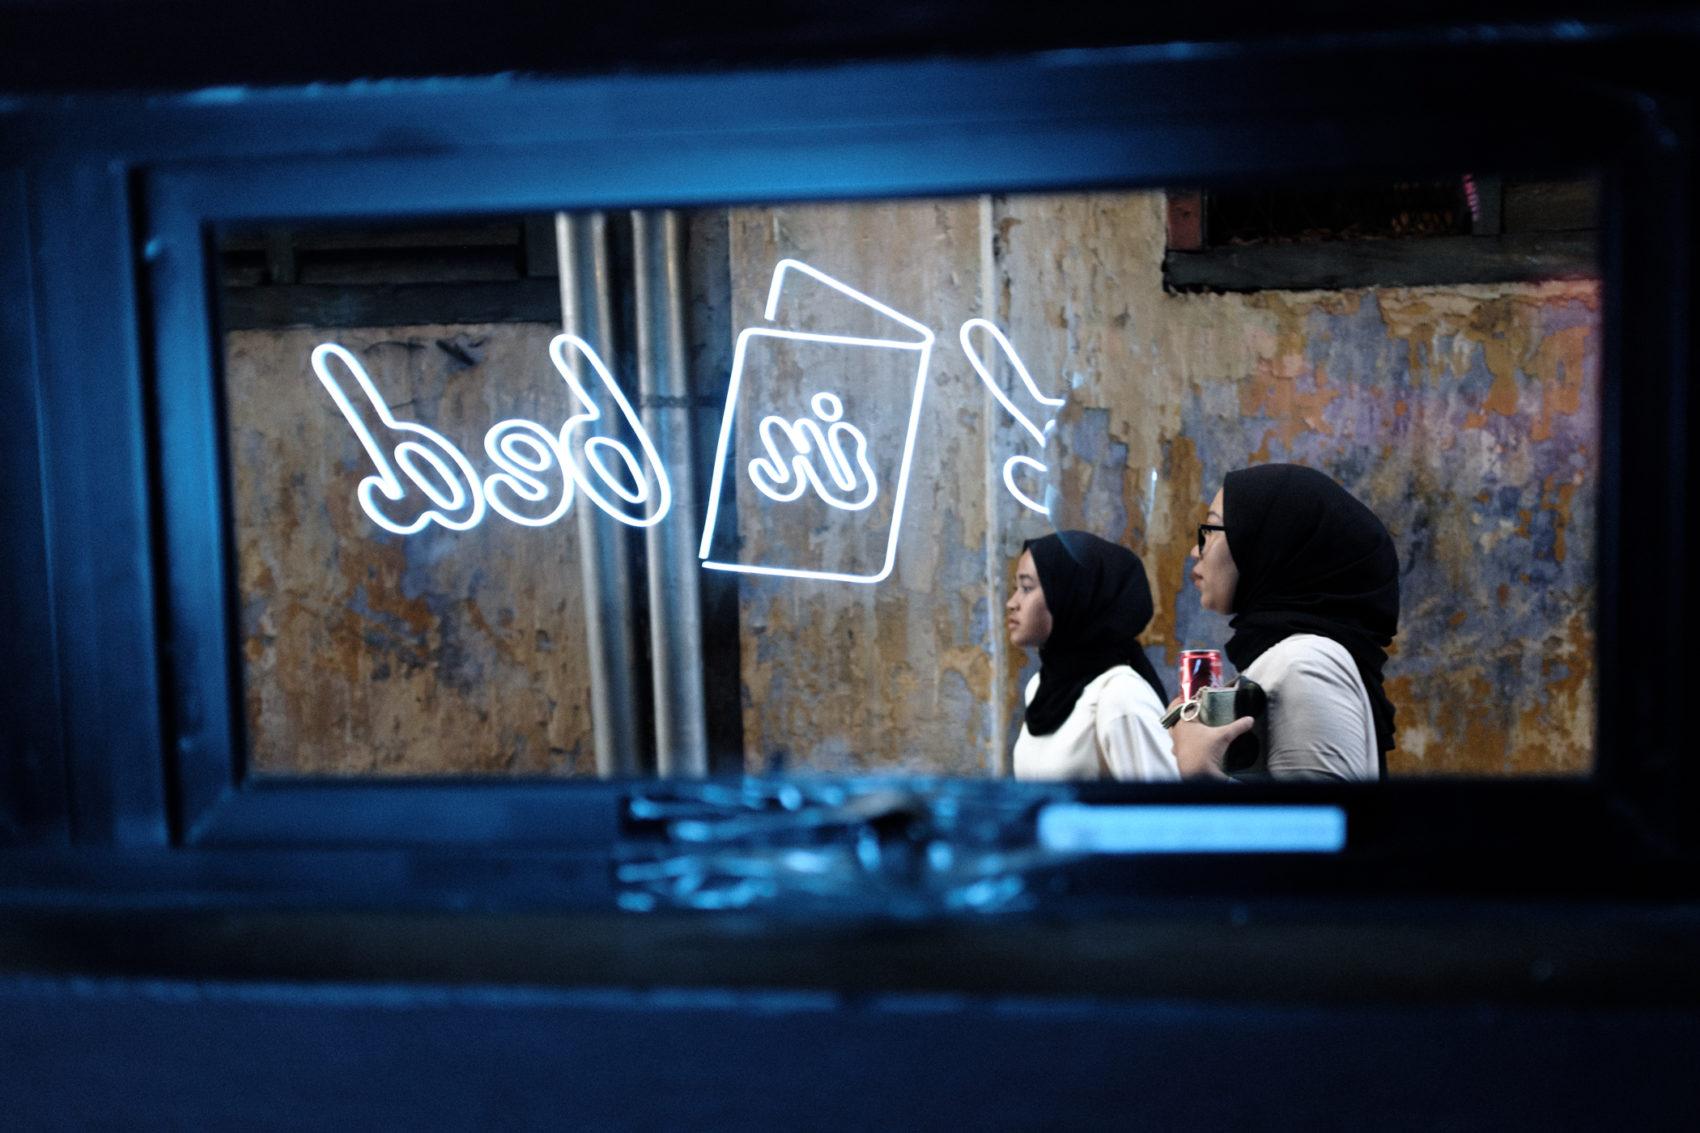 Malaysia 2019 ipoh jakub kadlec